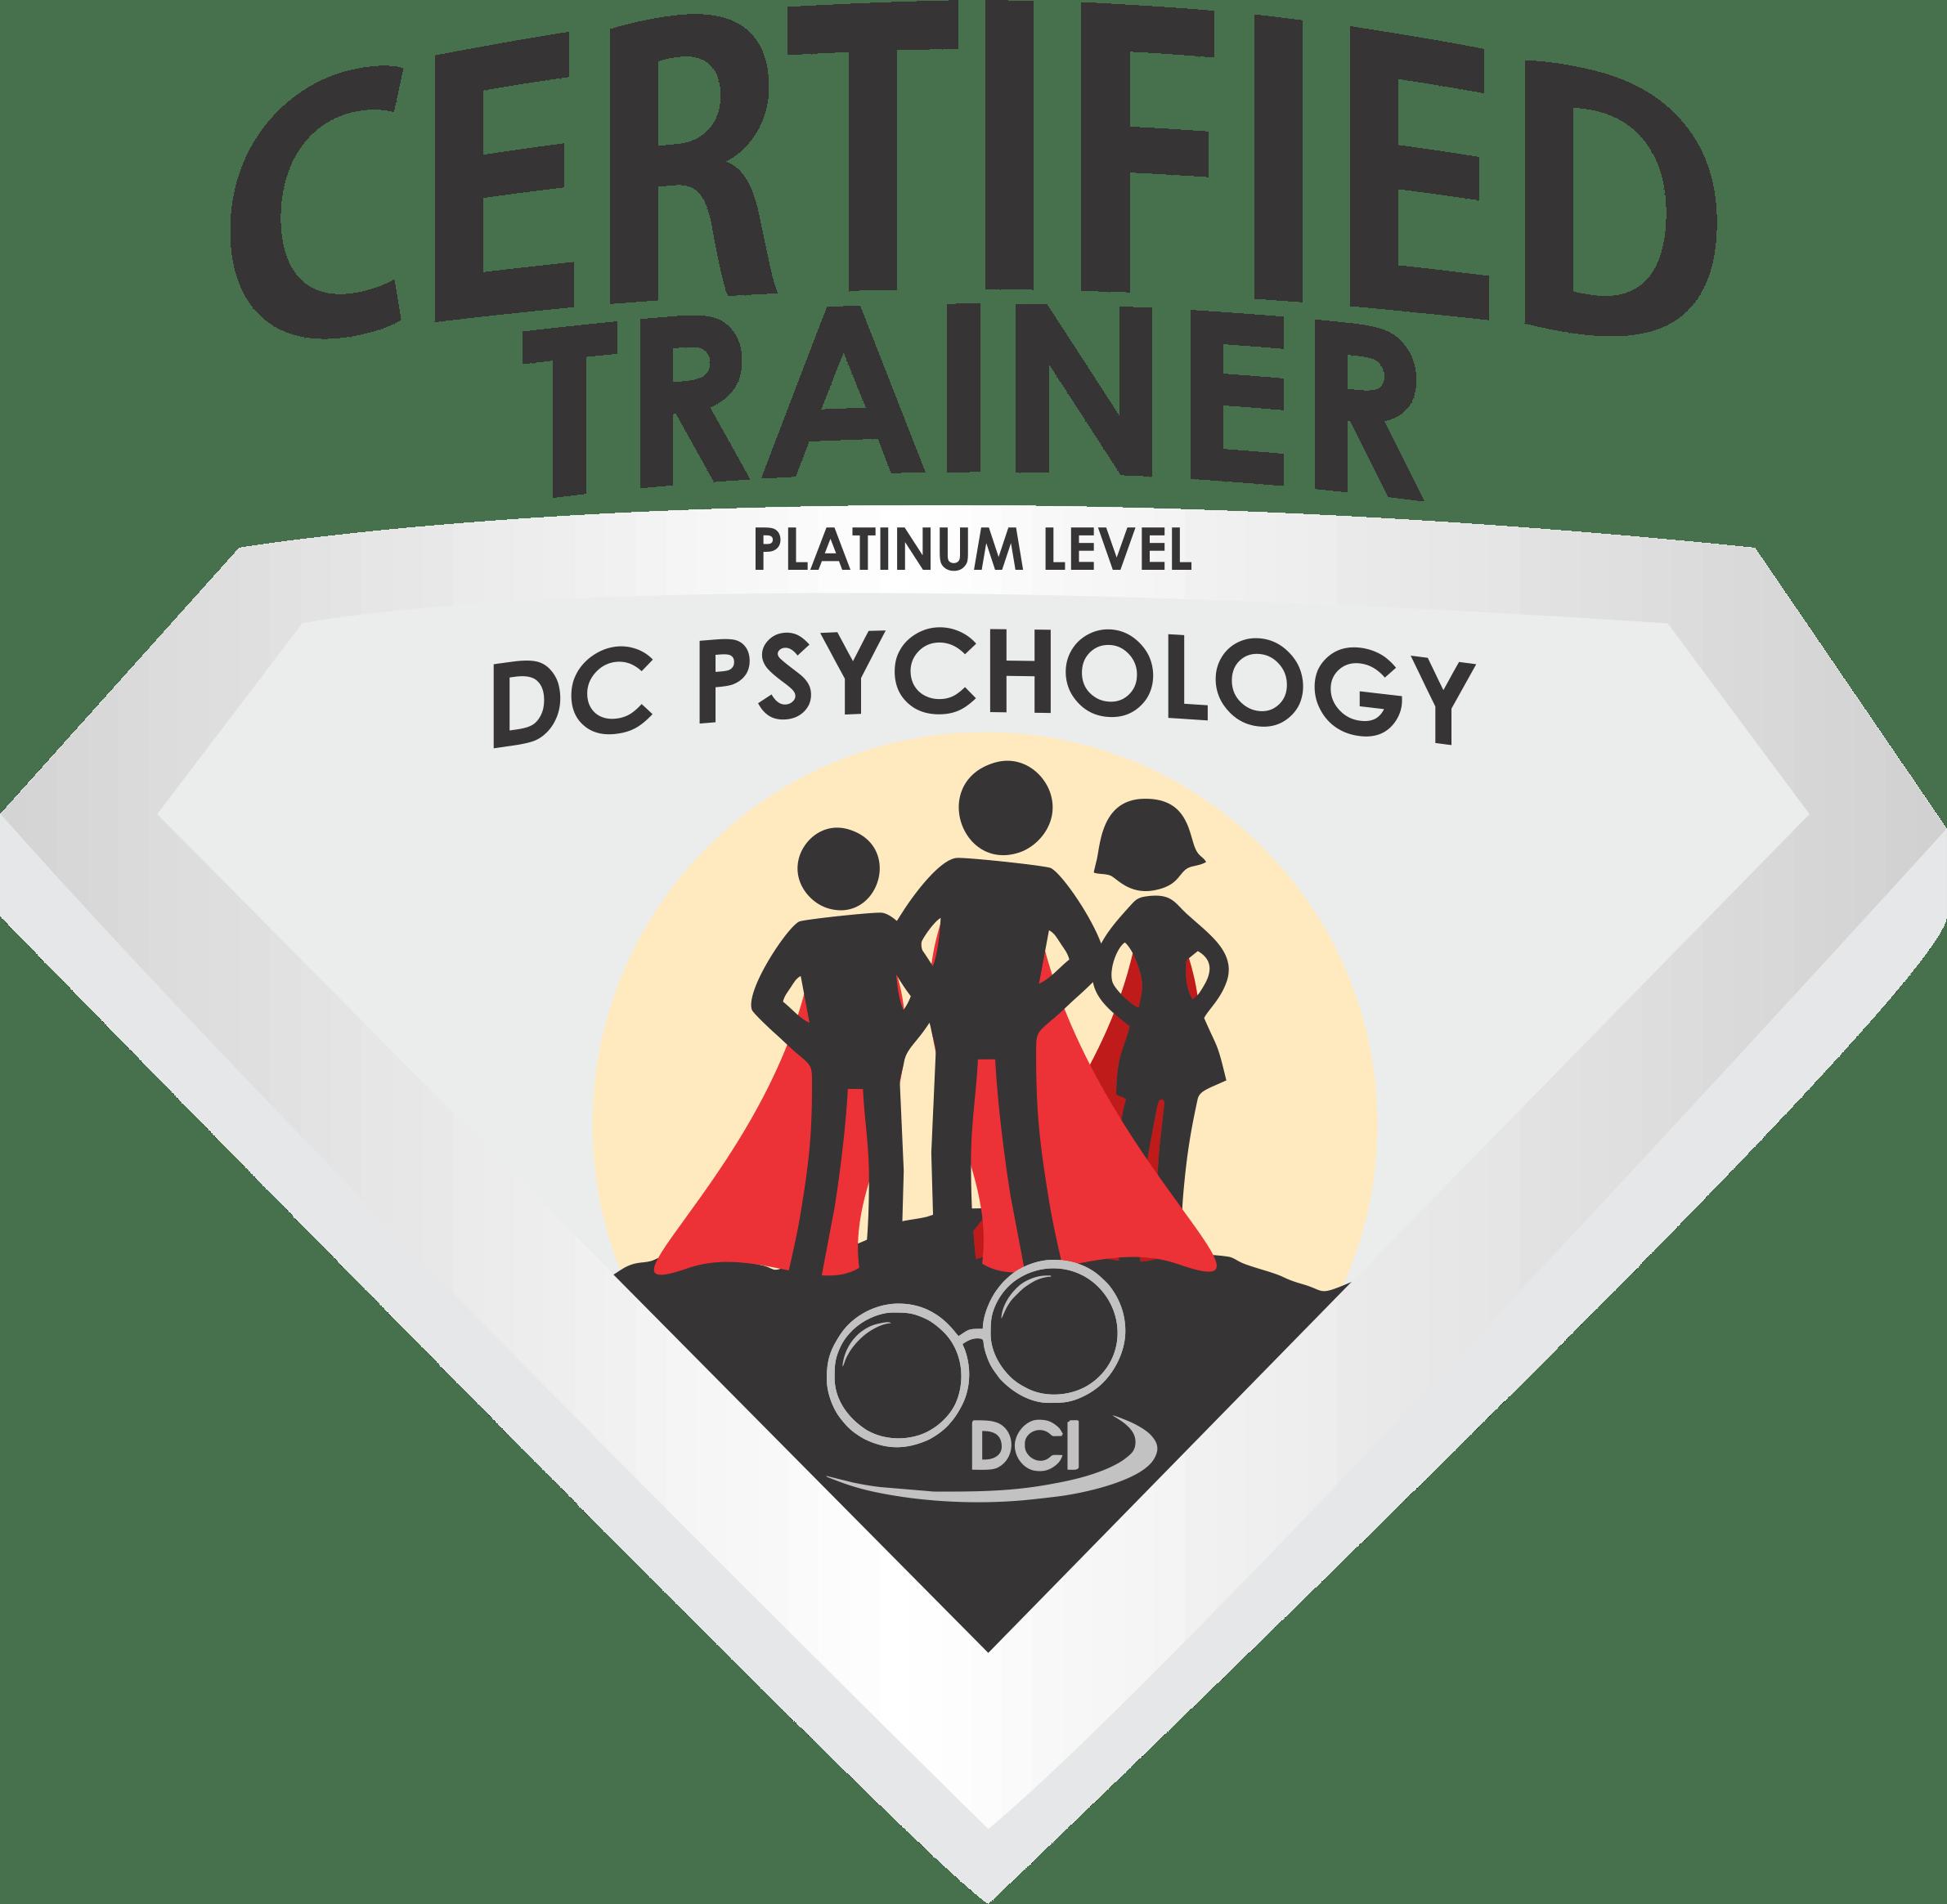 Achievement-Level-Certification-certified-trainer-platinum